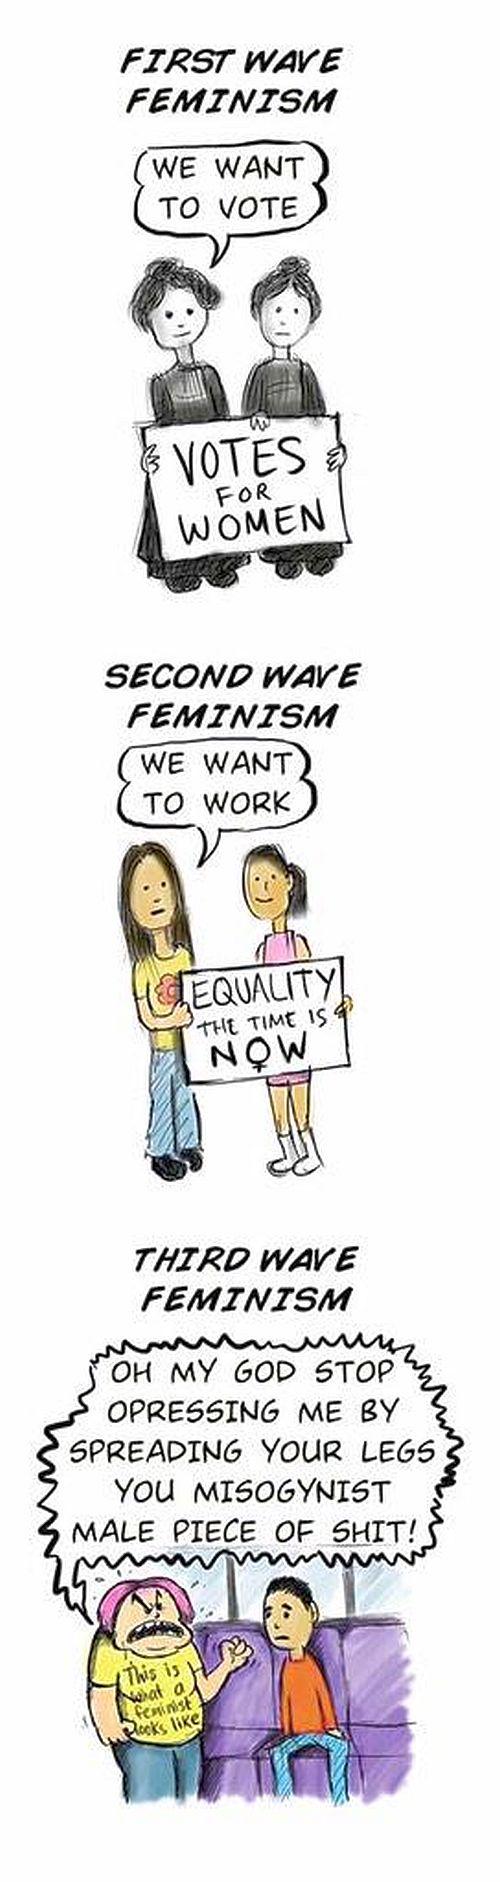 Feminism 3 waves 500